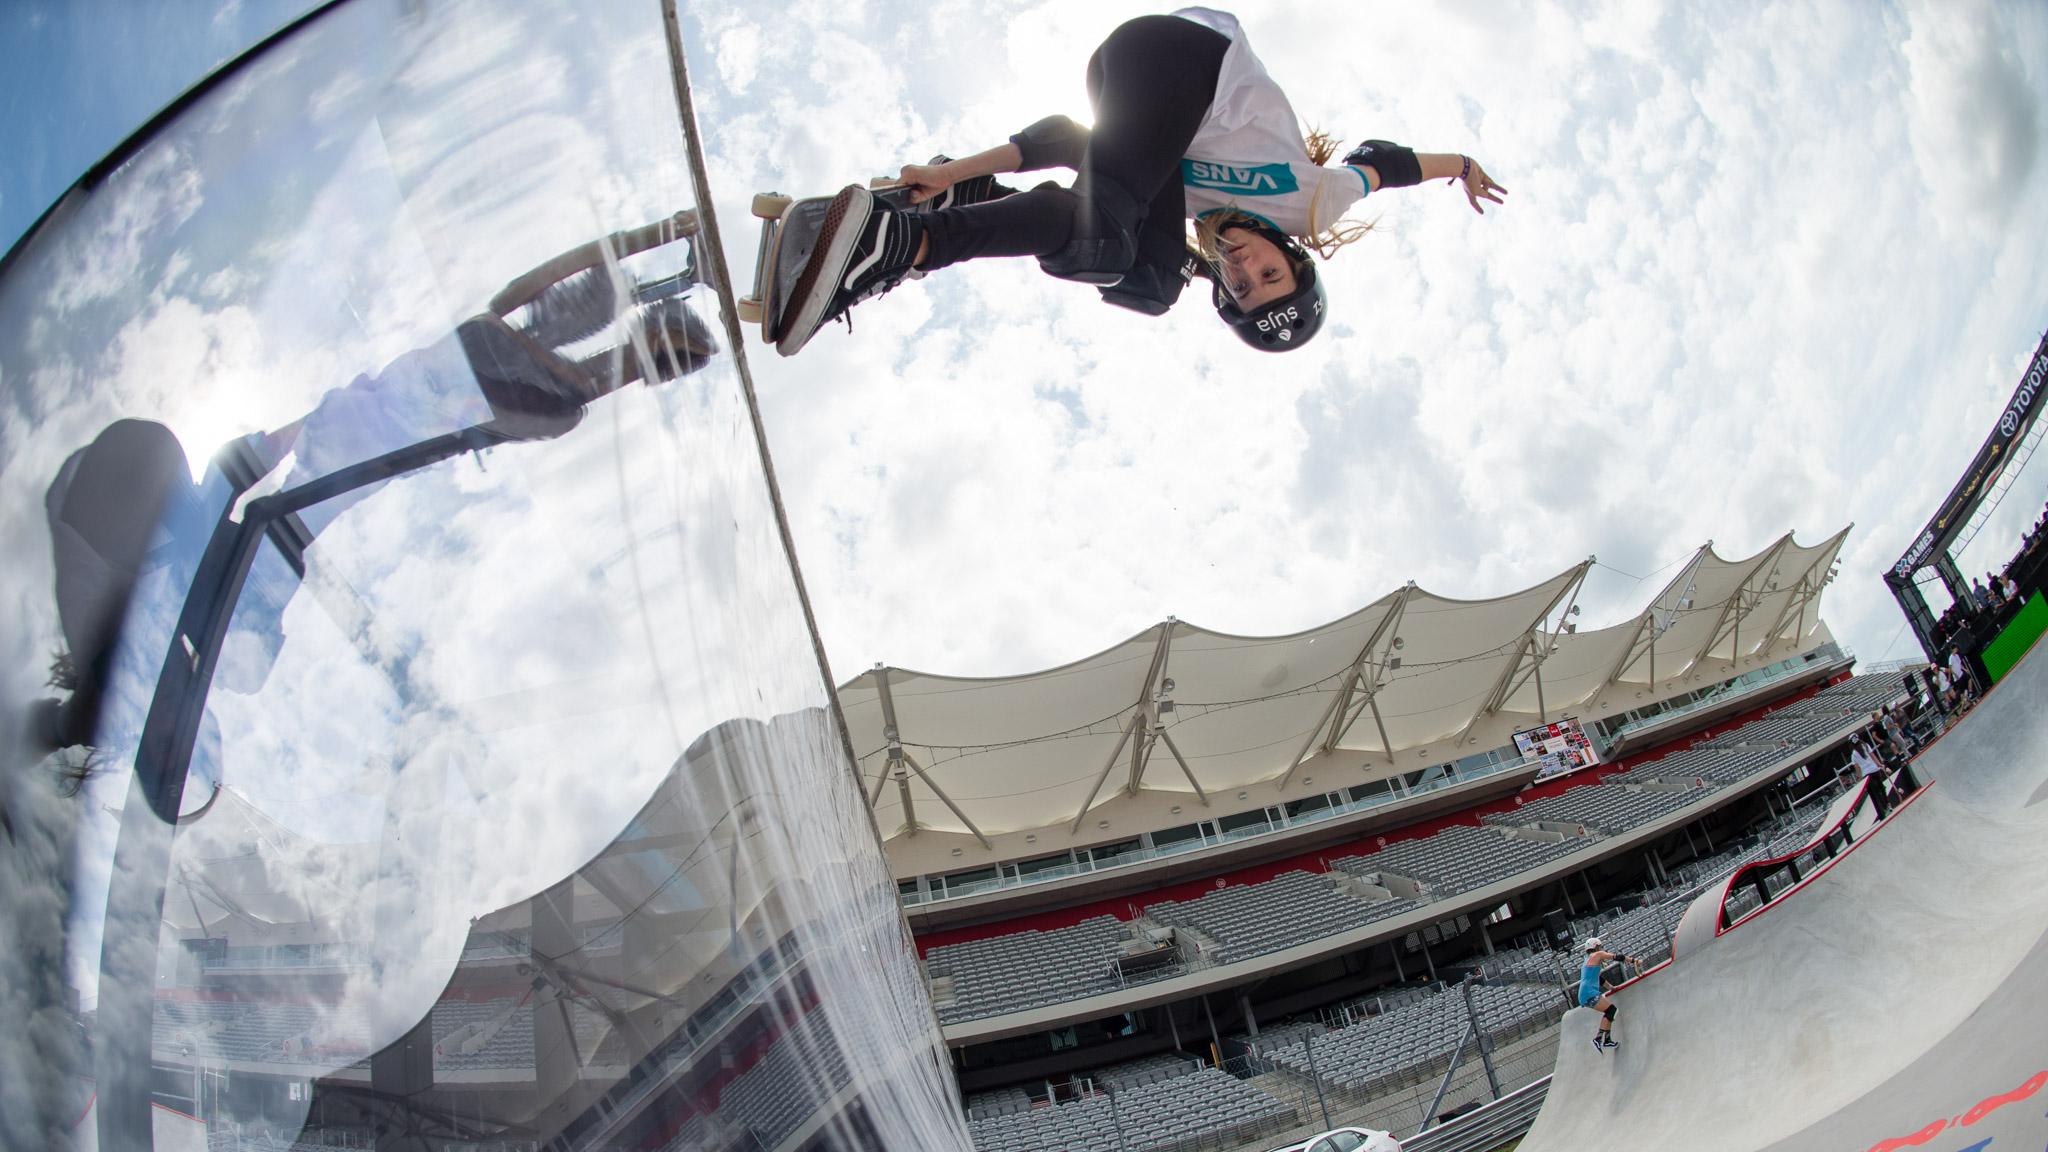 Skateboarding: Brighton Zeuner